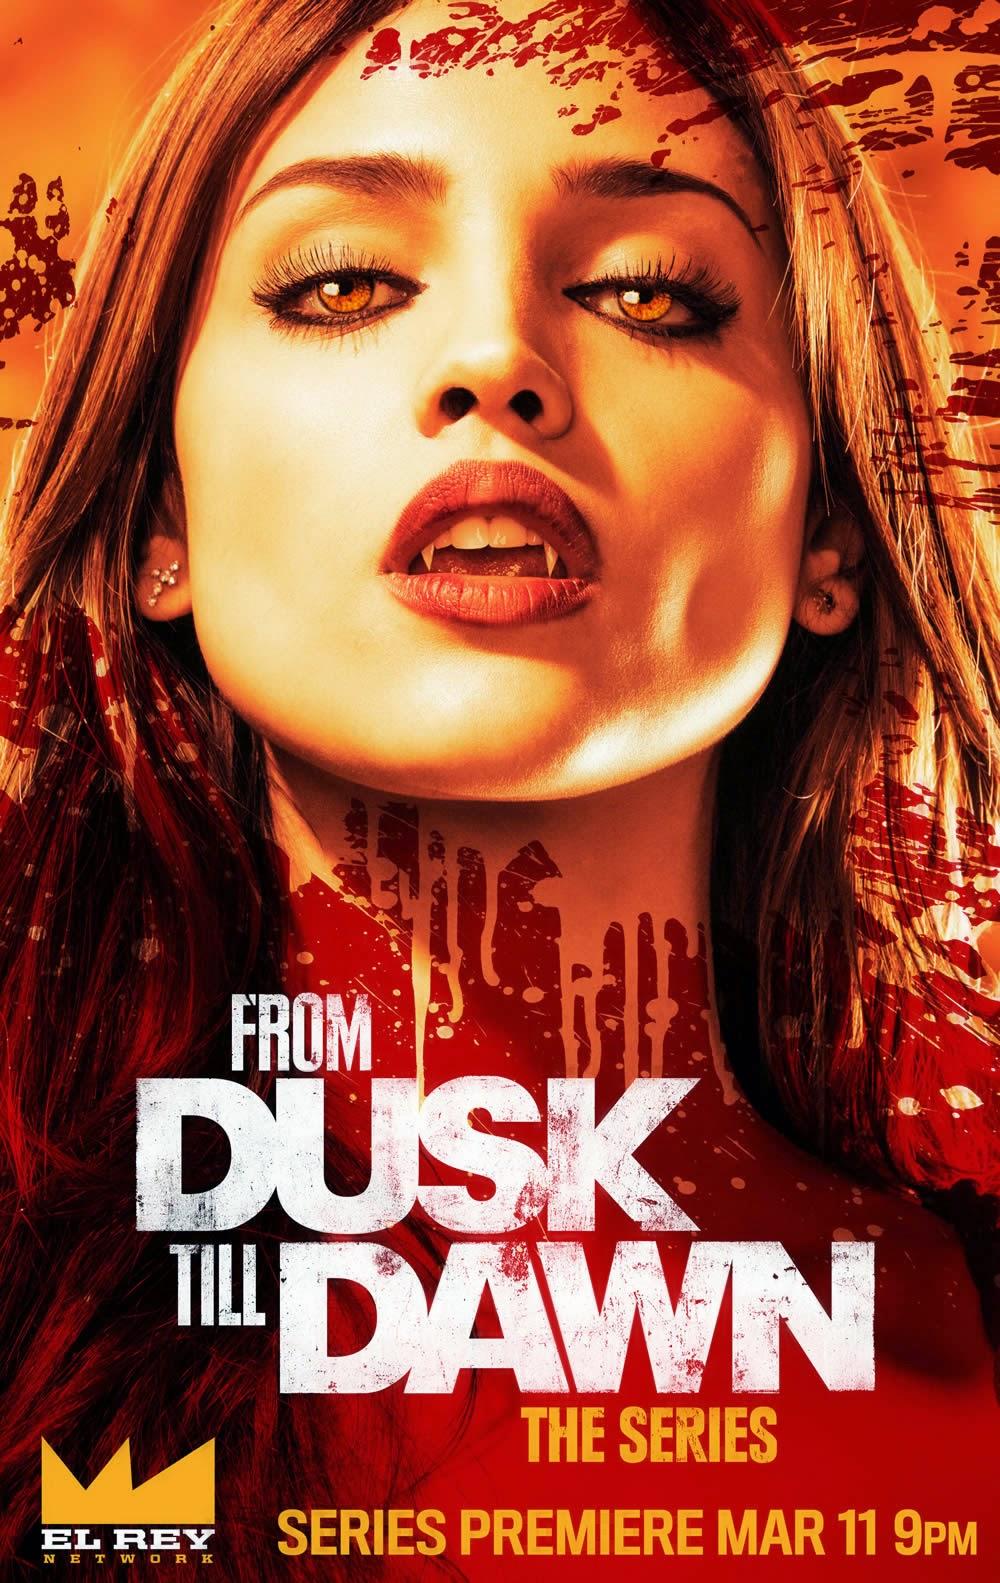 From Dusk Till Dawn (TV Series 2014)